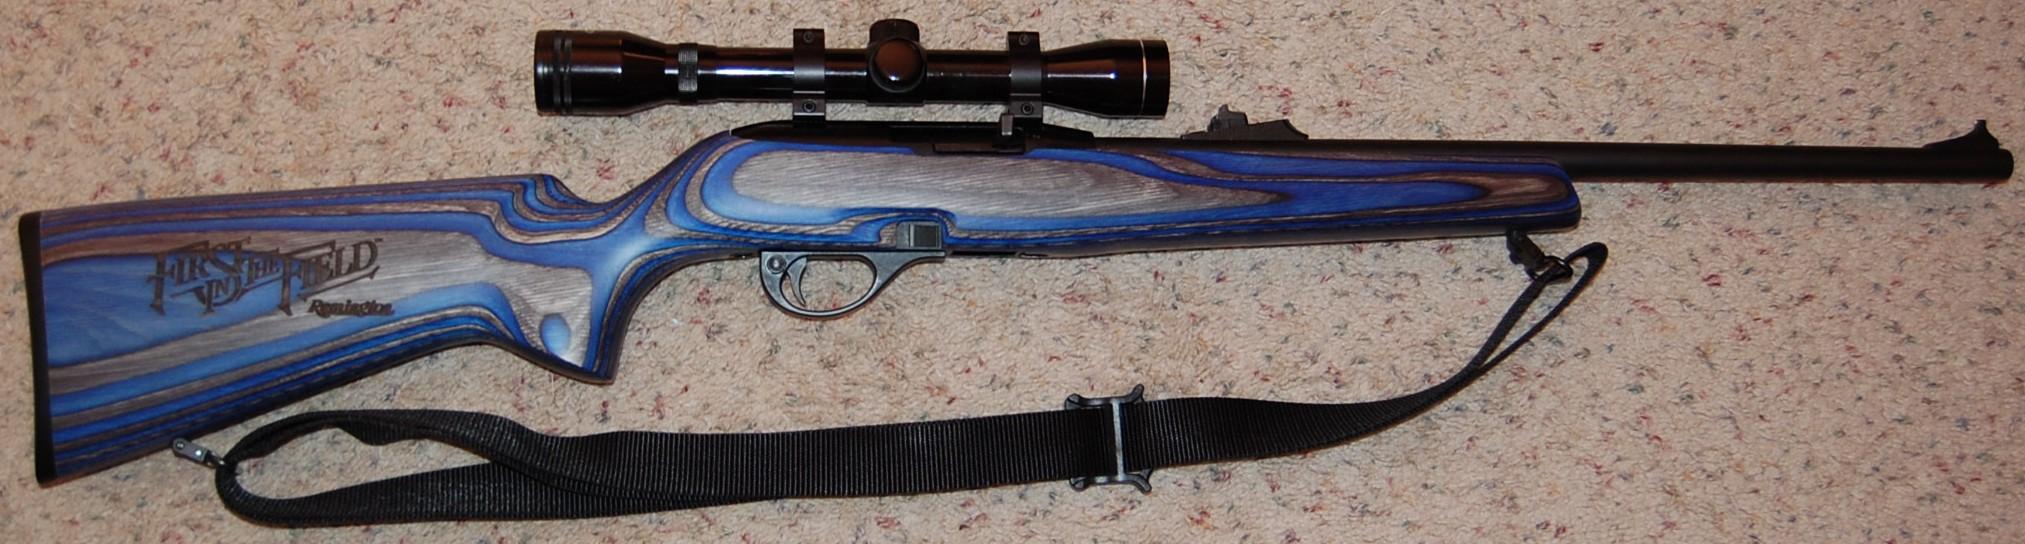 our new Remington 597 range report-remington-597.jpg